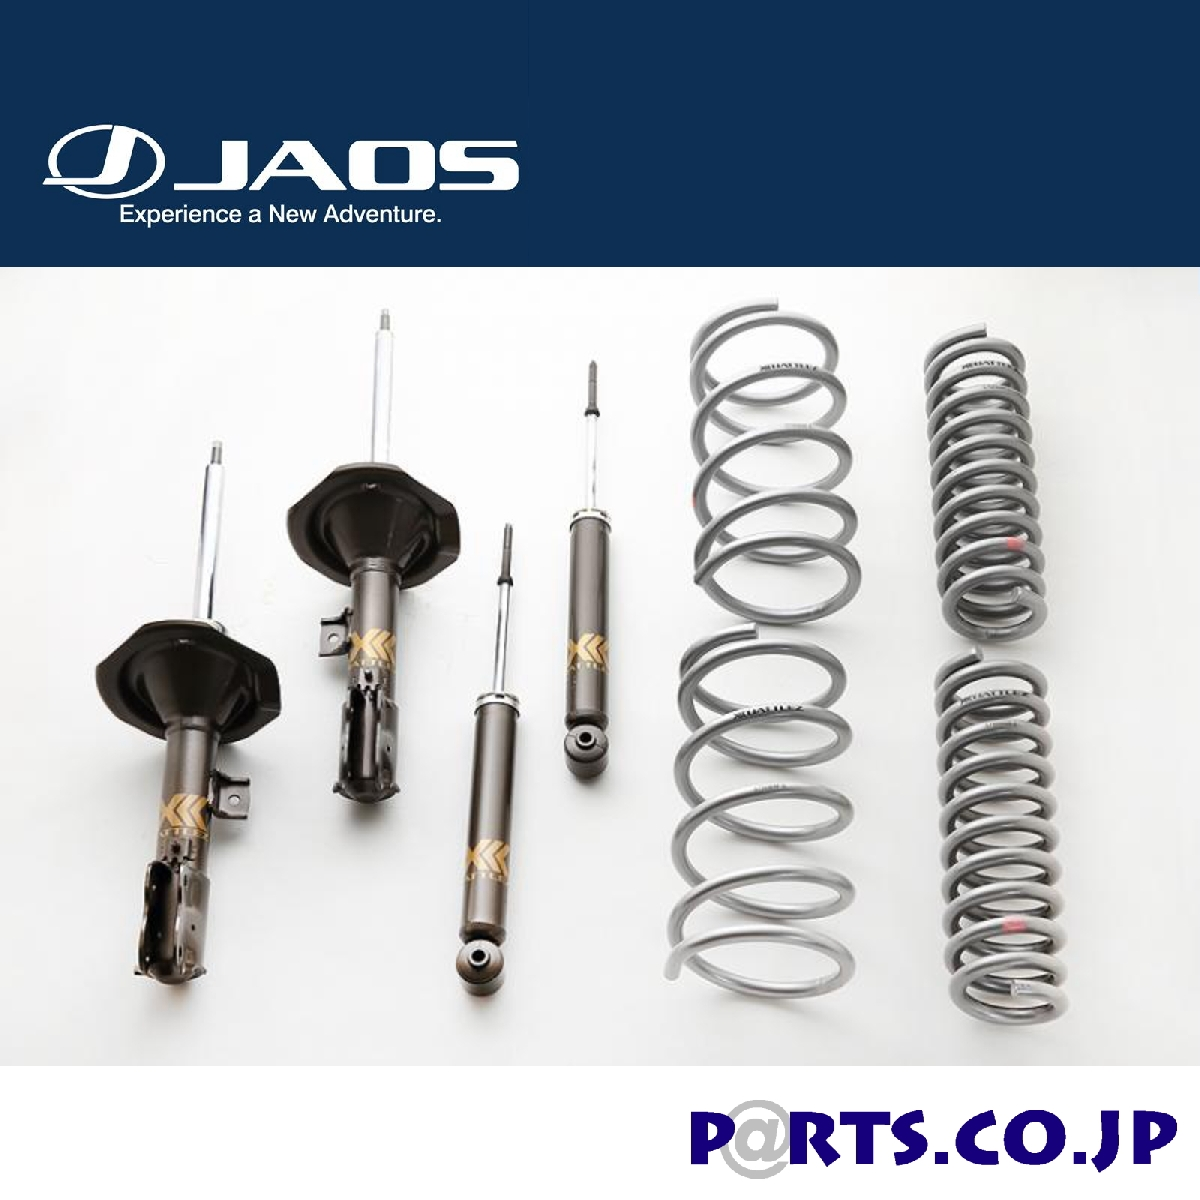 JAOS(ジャオス) 三菱 デリカD:5 スプリング&ショックセット BATTLEZ UP SUSPENSION SET VFS DELICA D:5 07-12 4WD